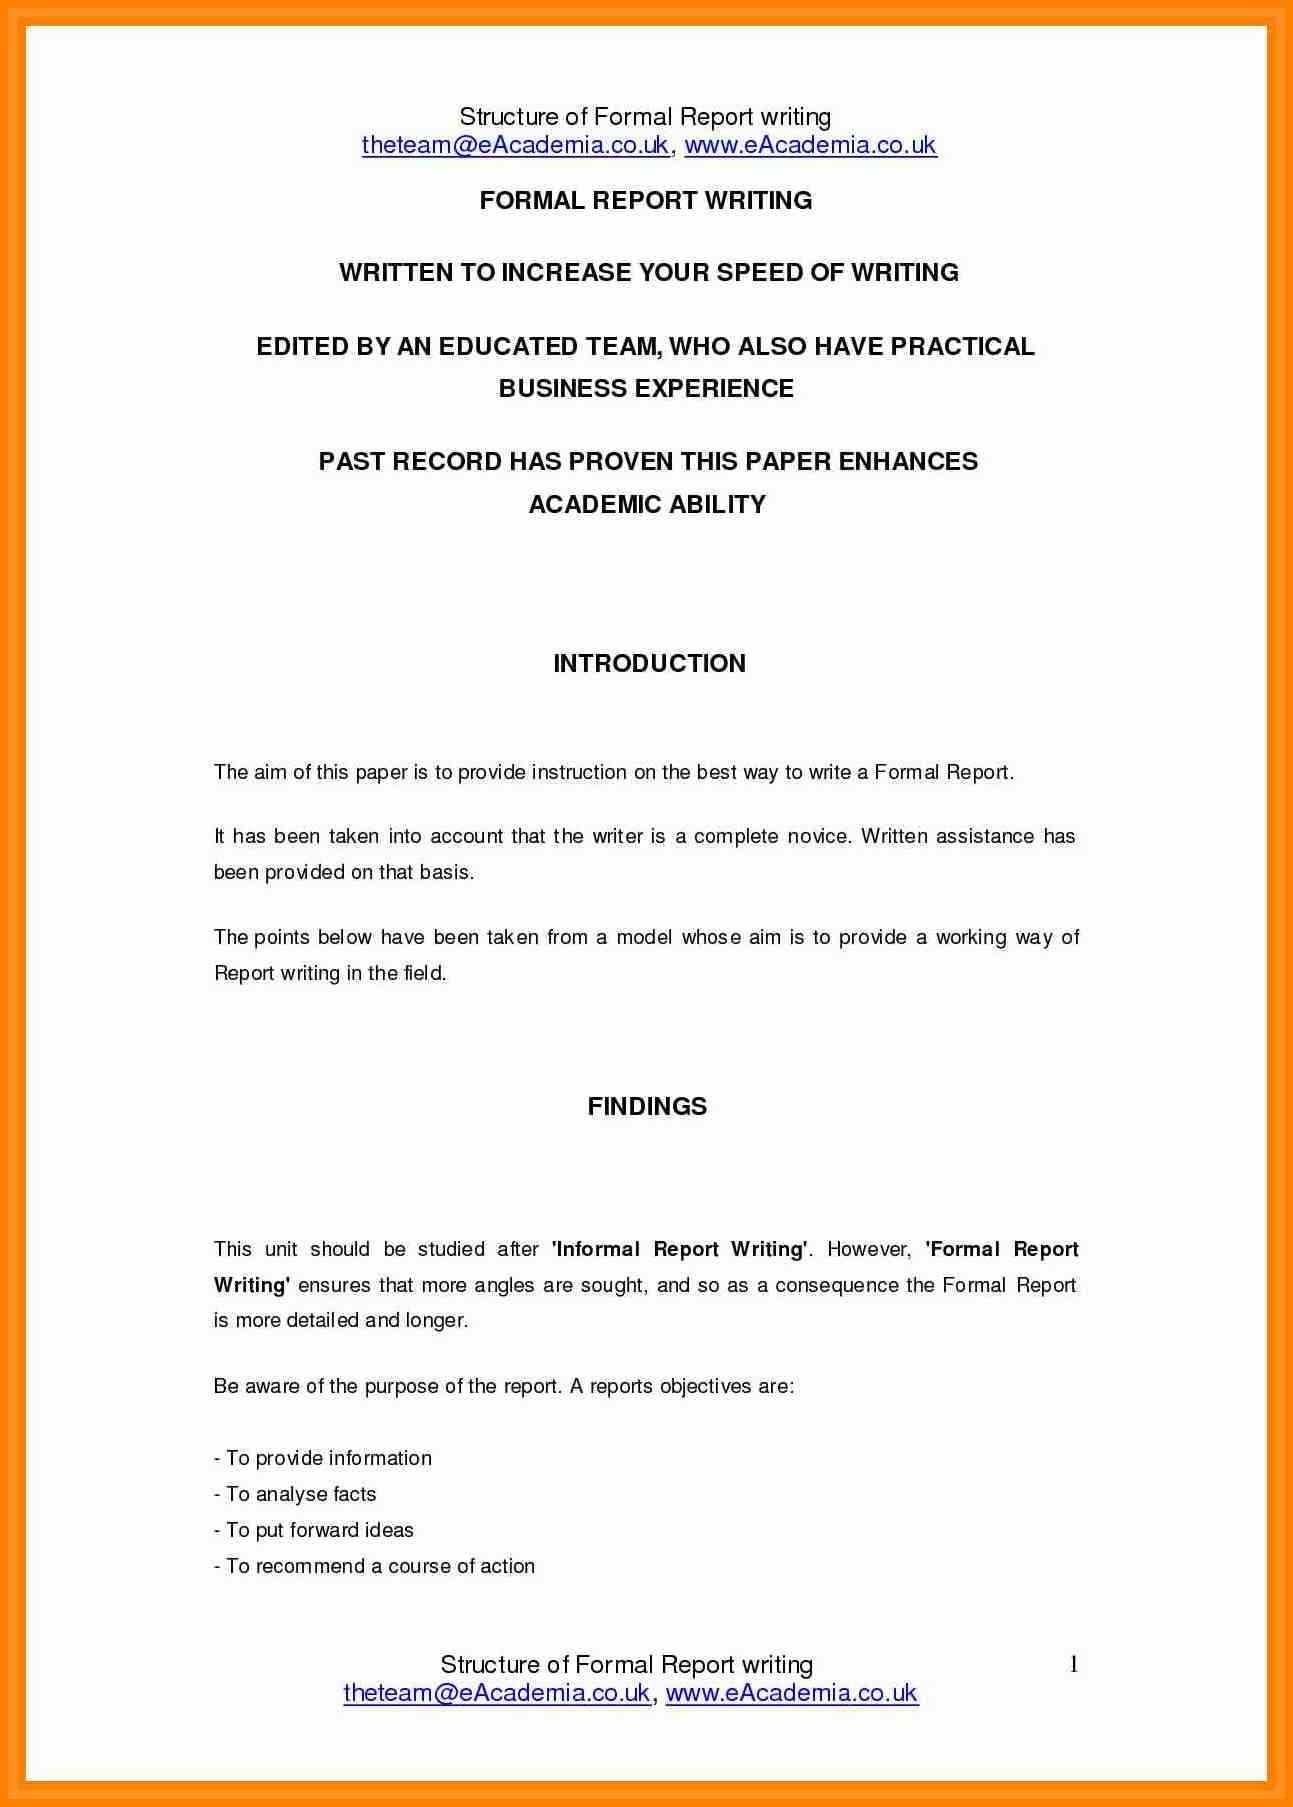 formal report writing1